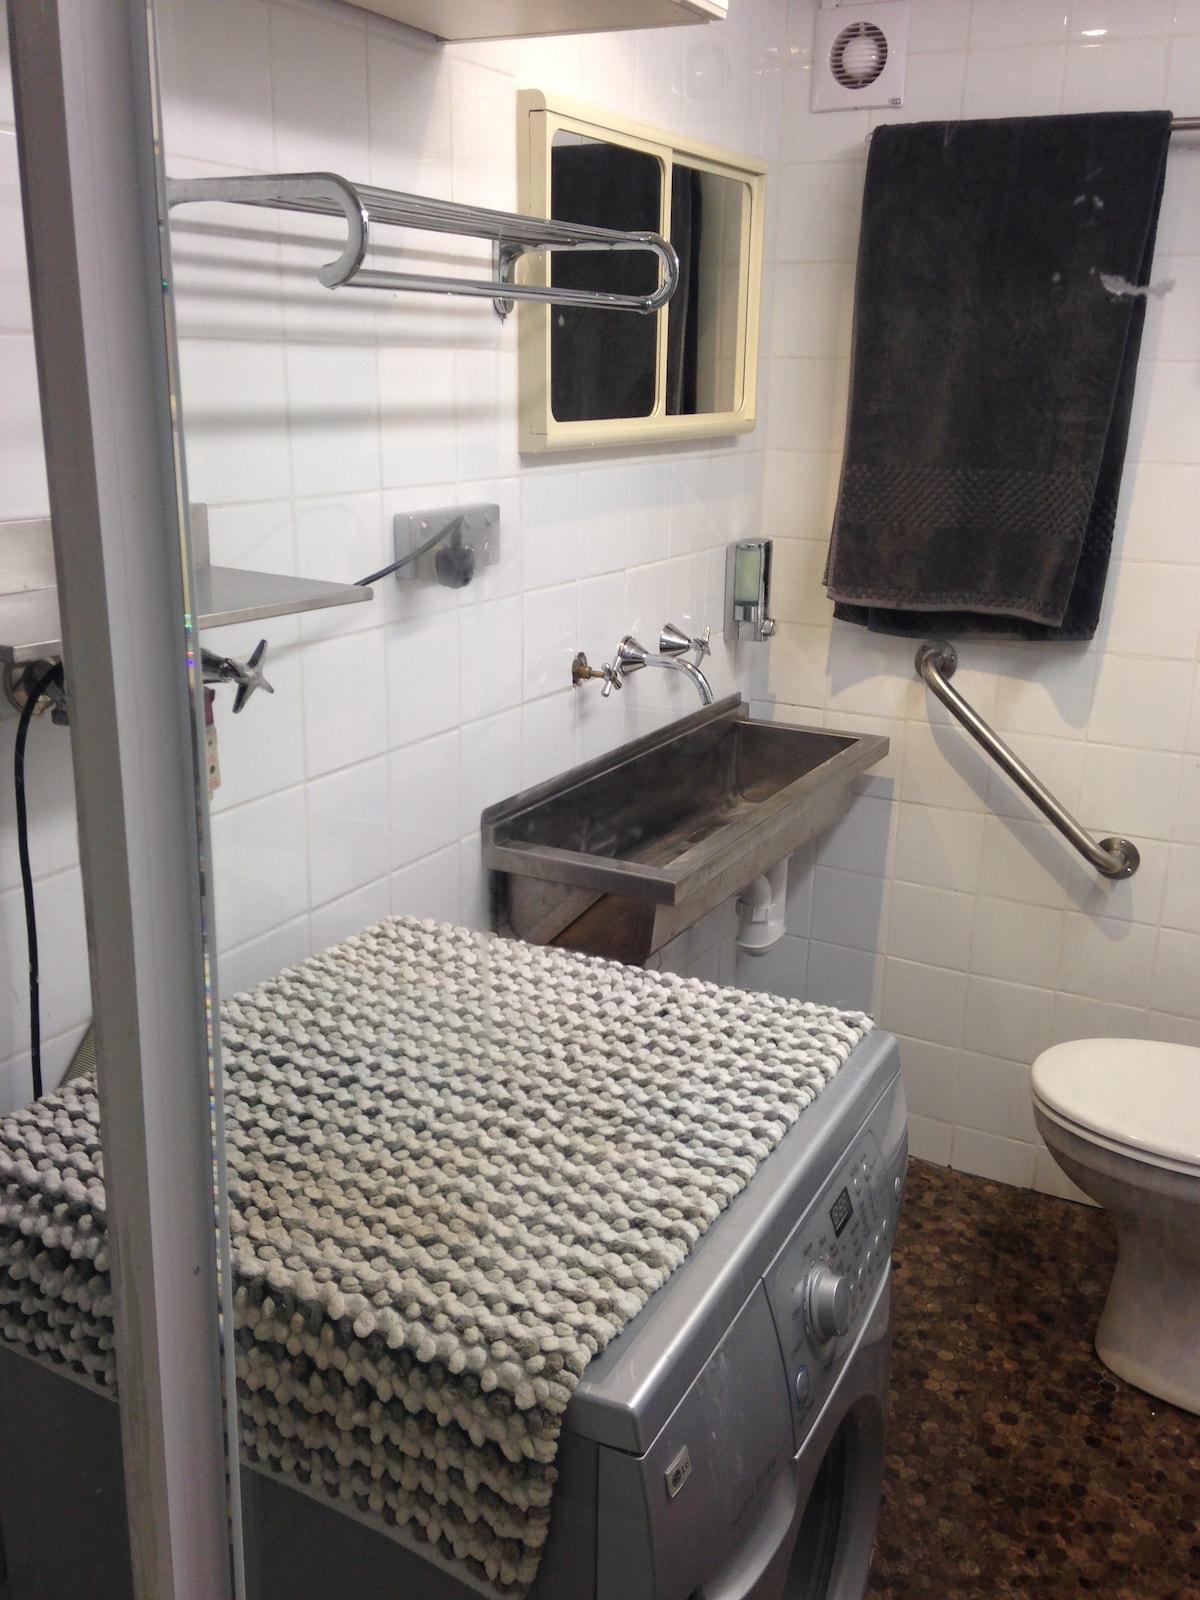 Wshing machine and trough in 2nd Bathroom